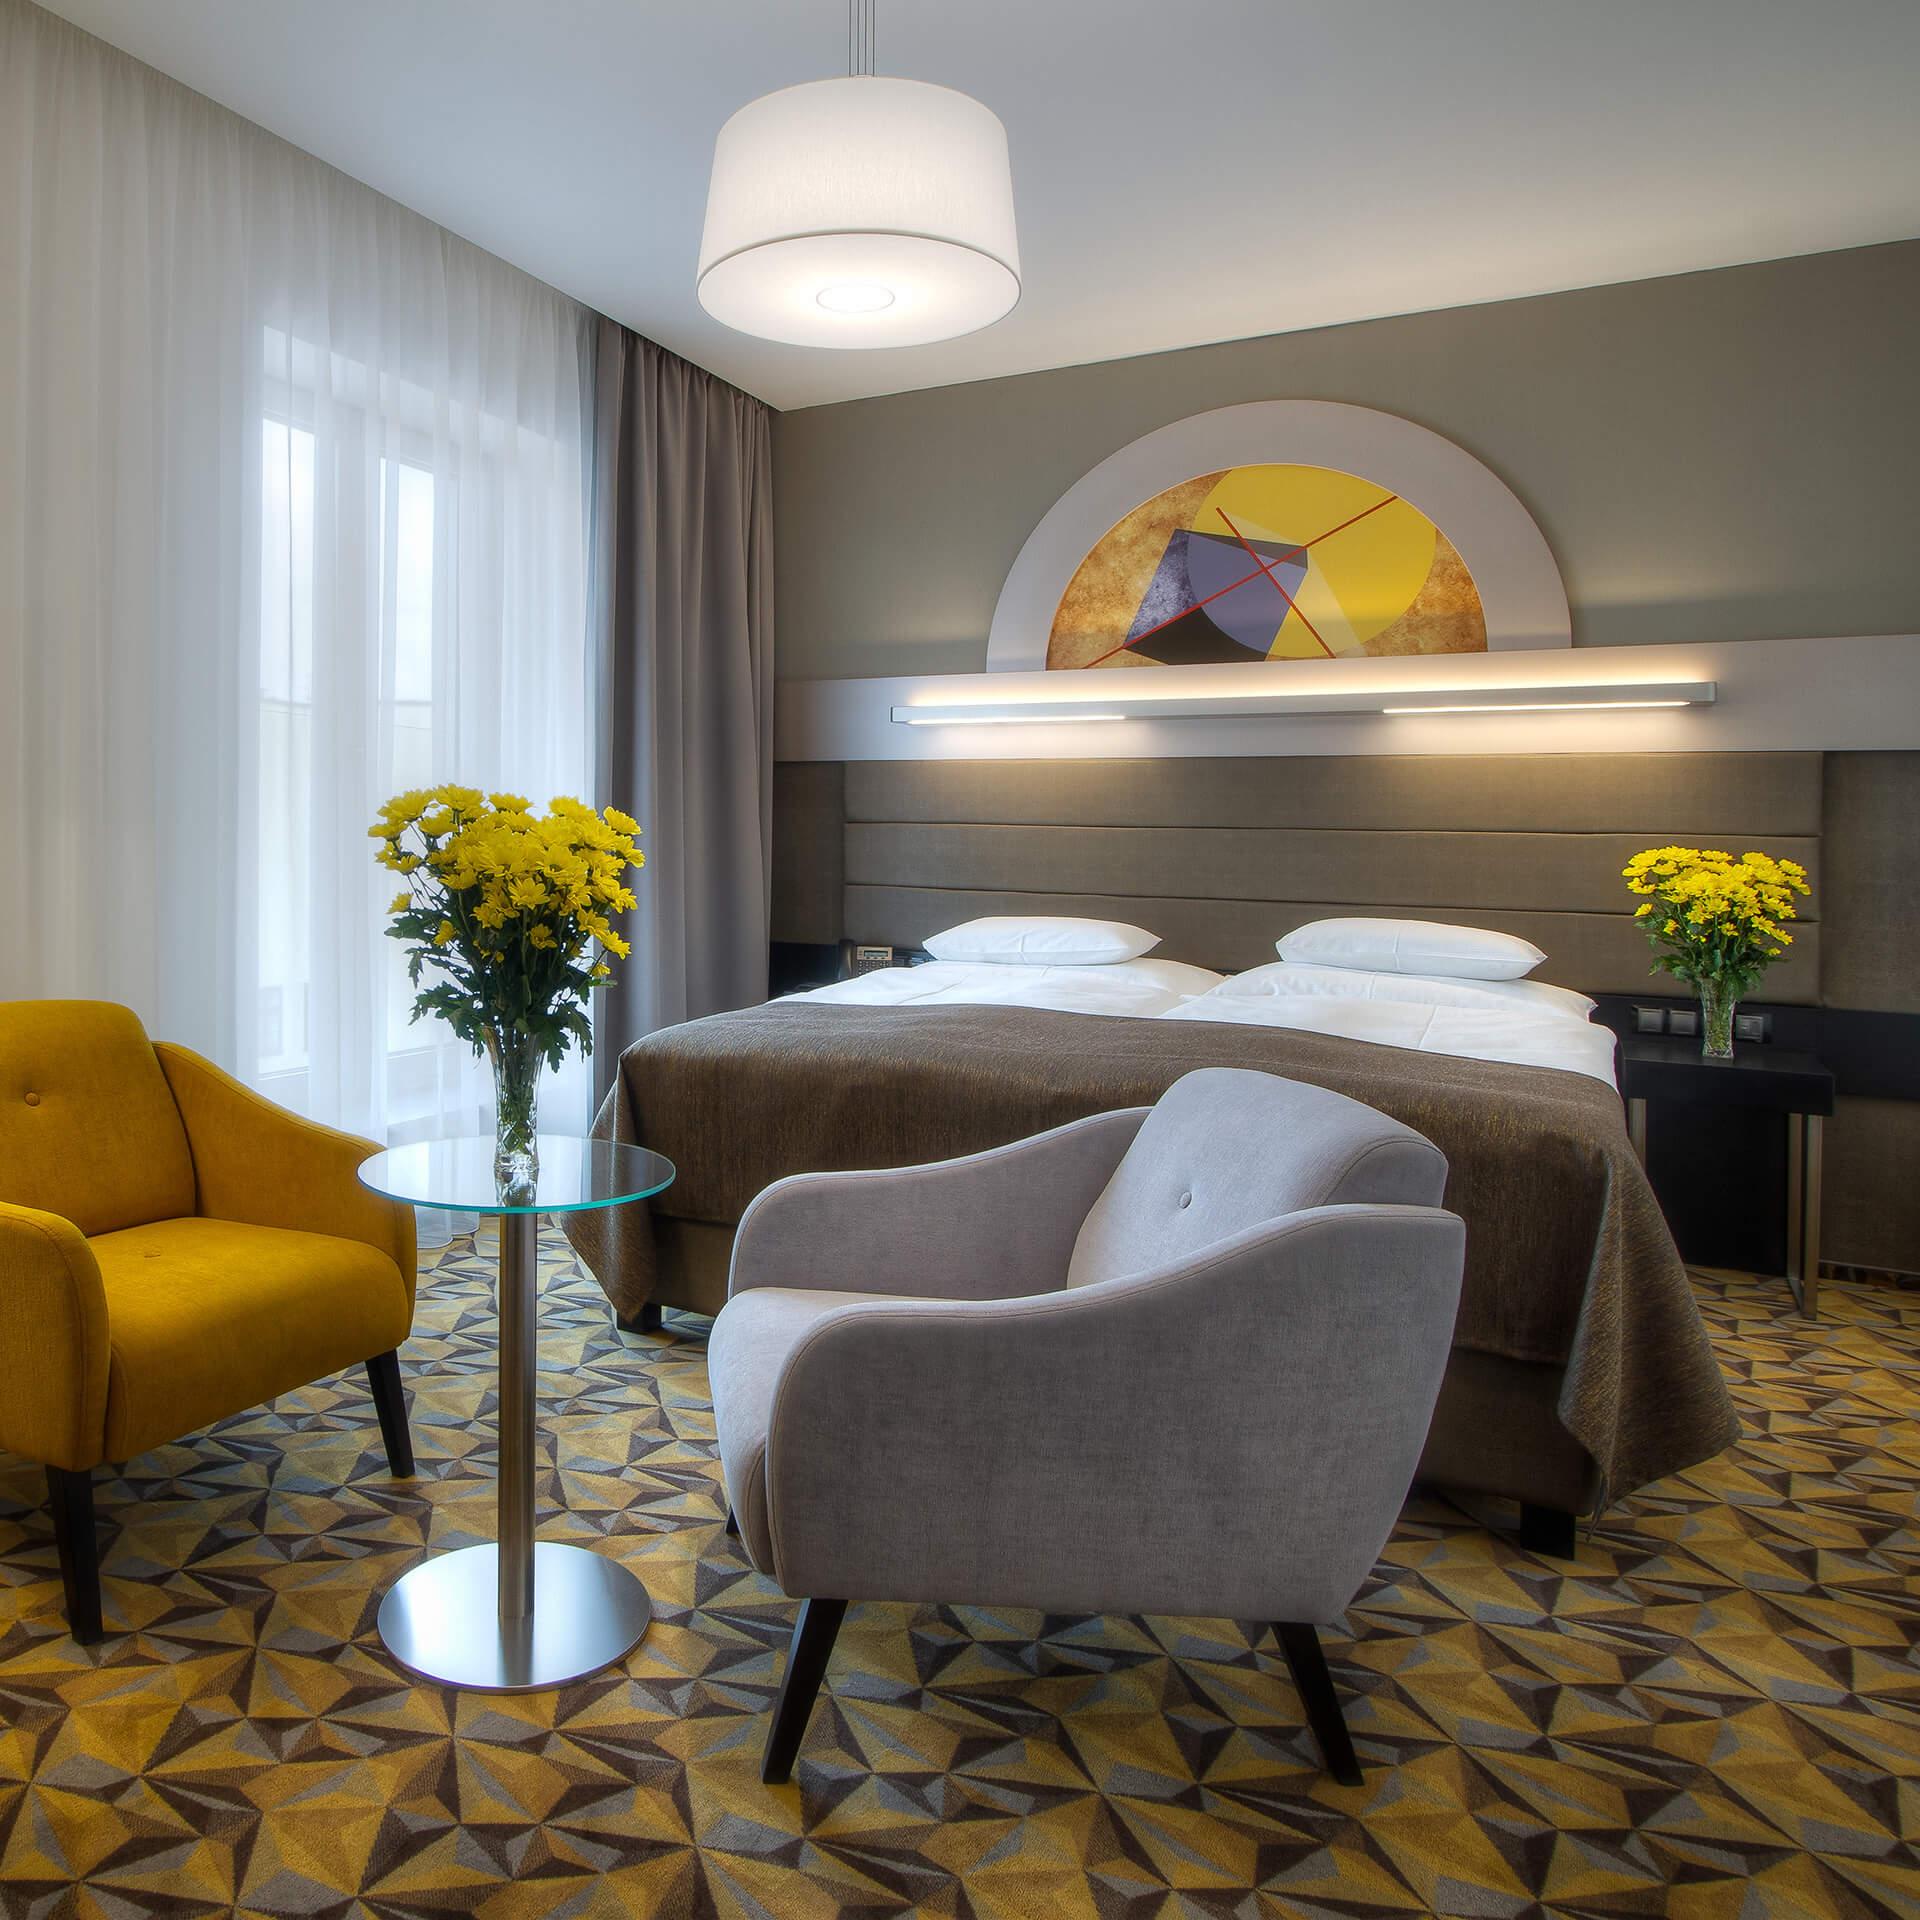 Best Western Premier Essence Hotel Doppelzimmer